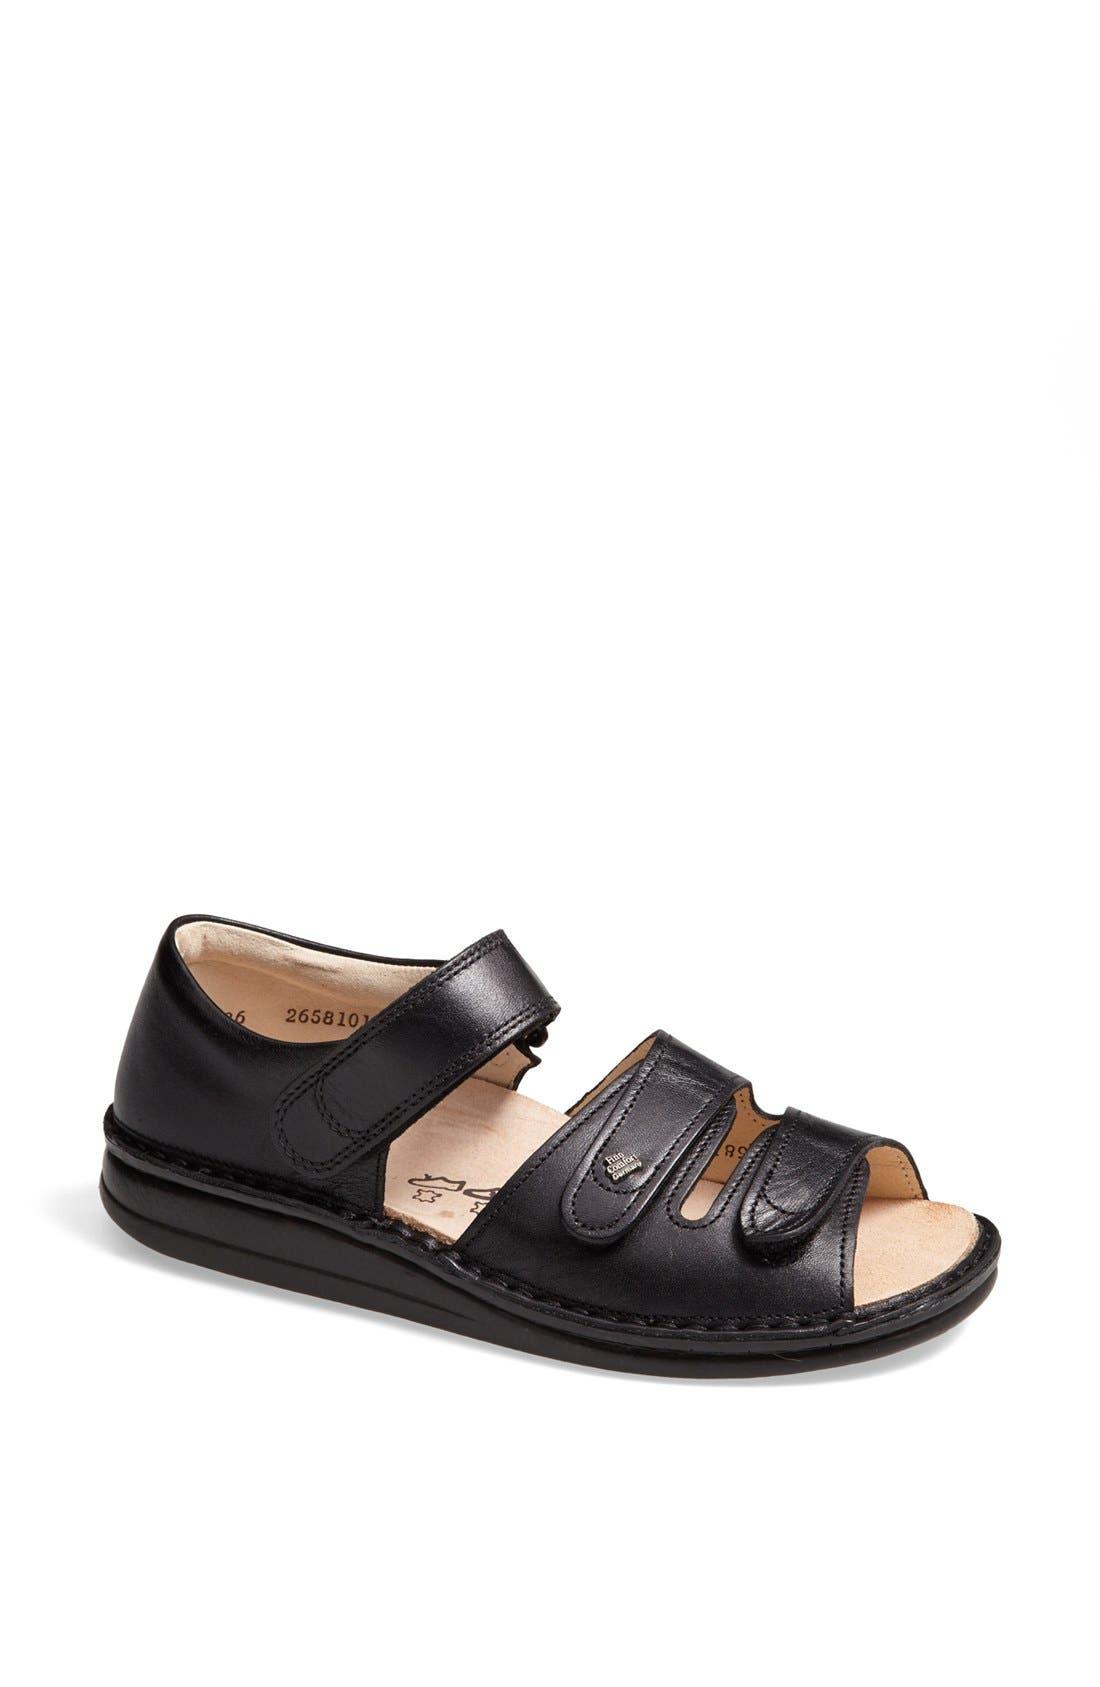 Main Image - Finn Comfort 'Baltrum 1518' Leather Sandal